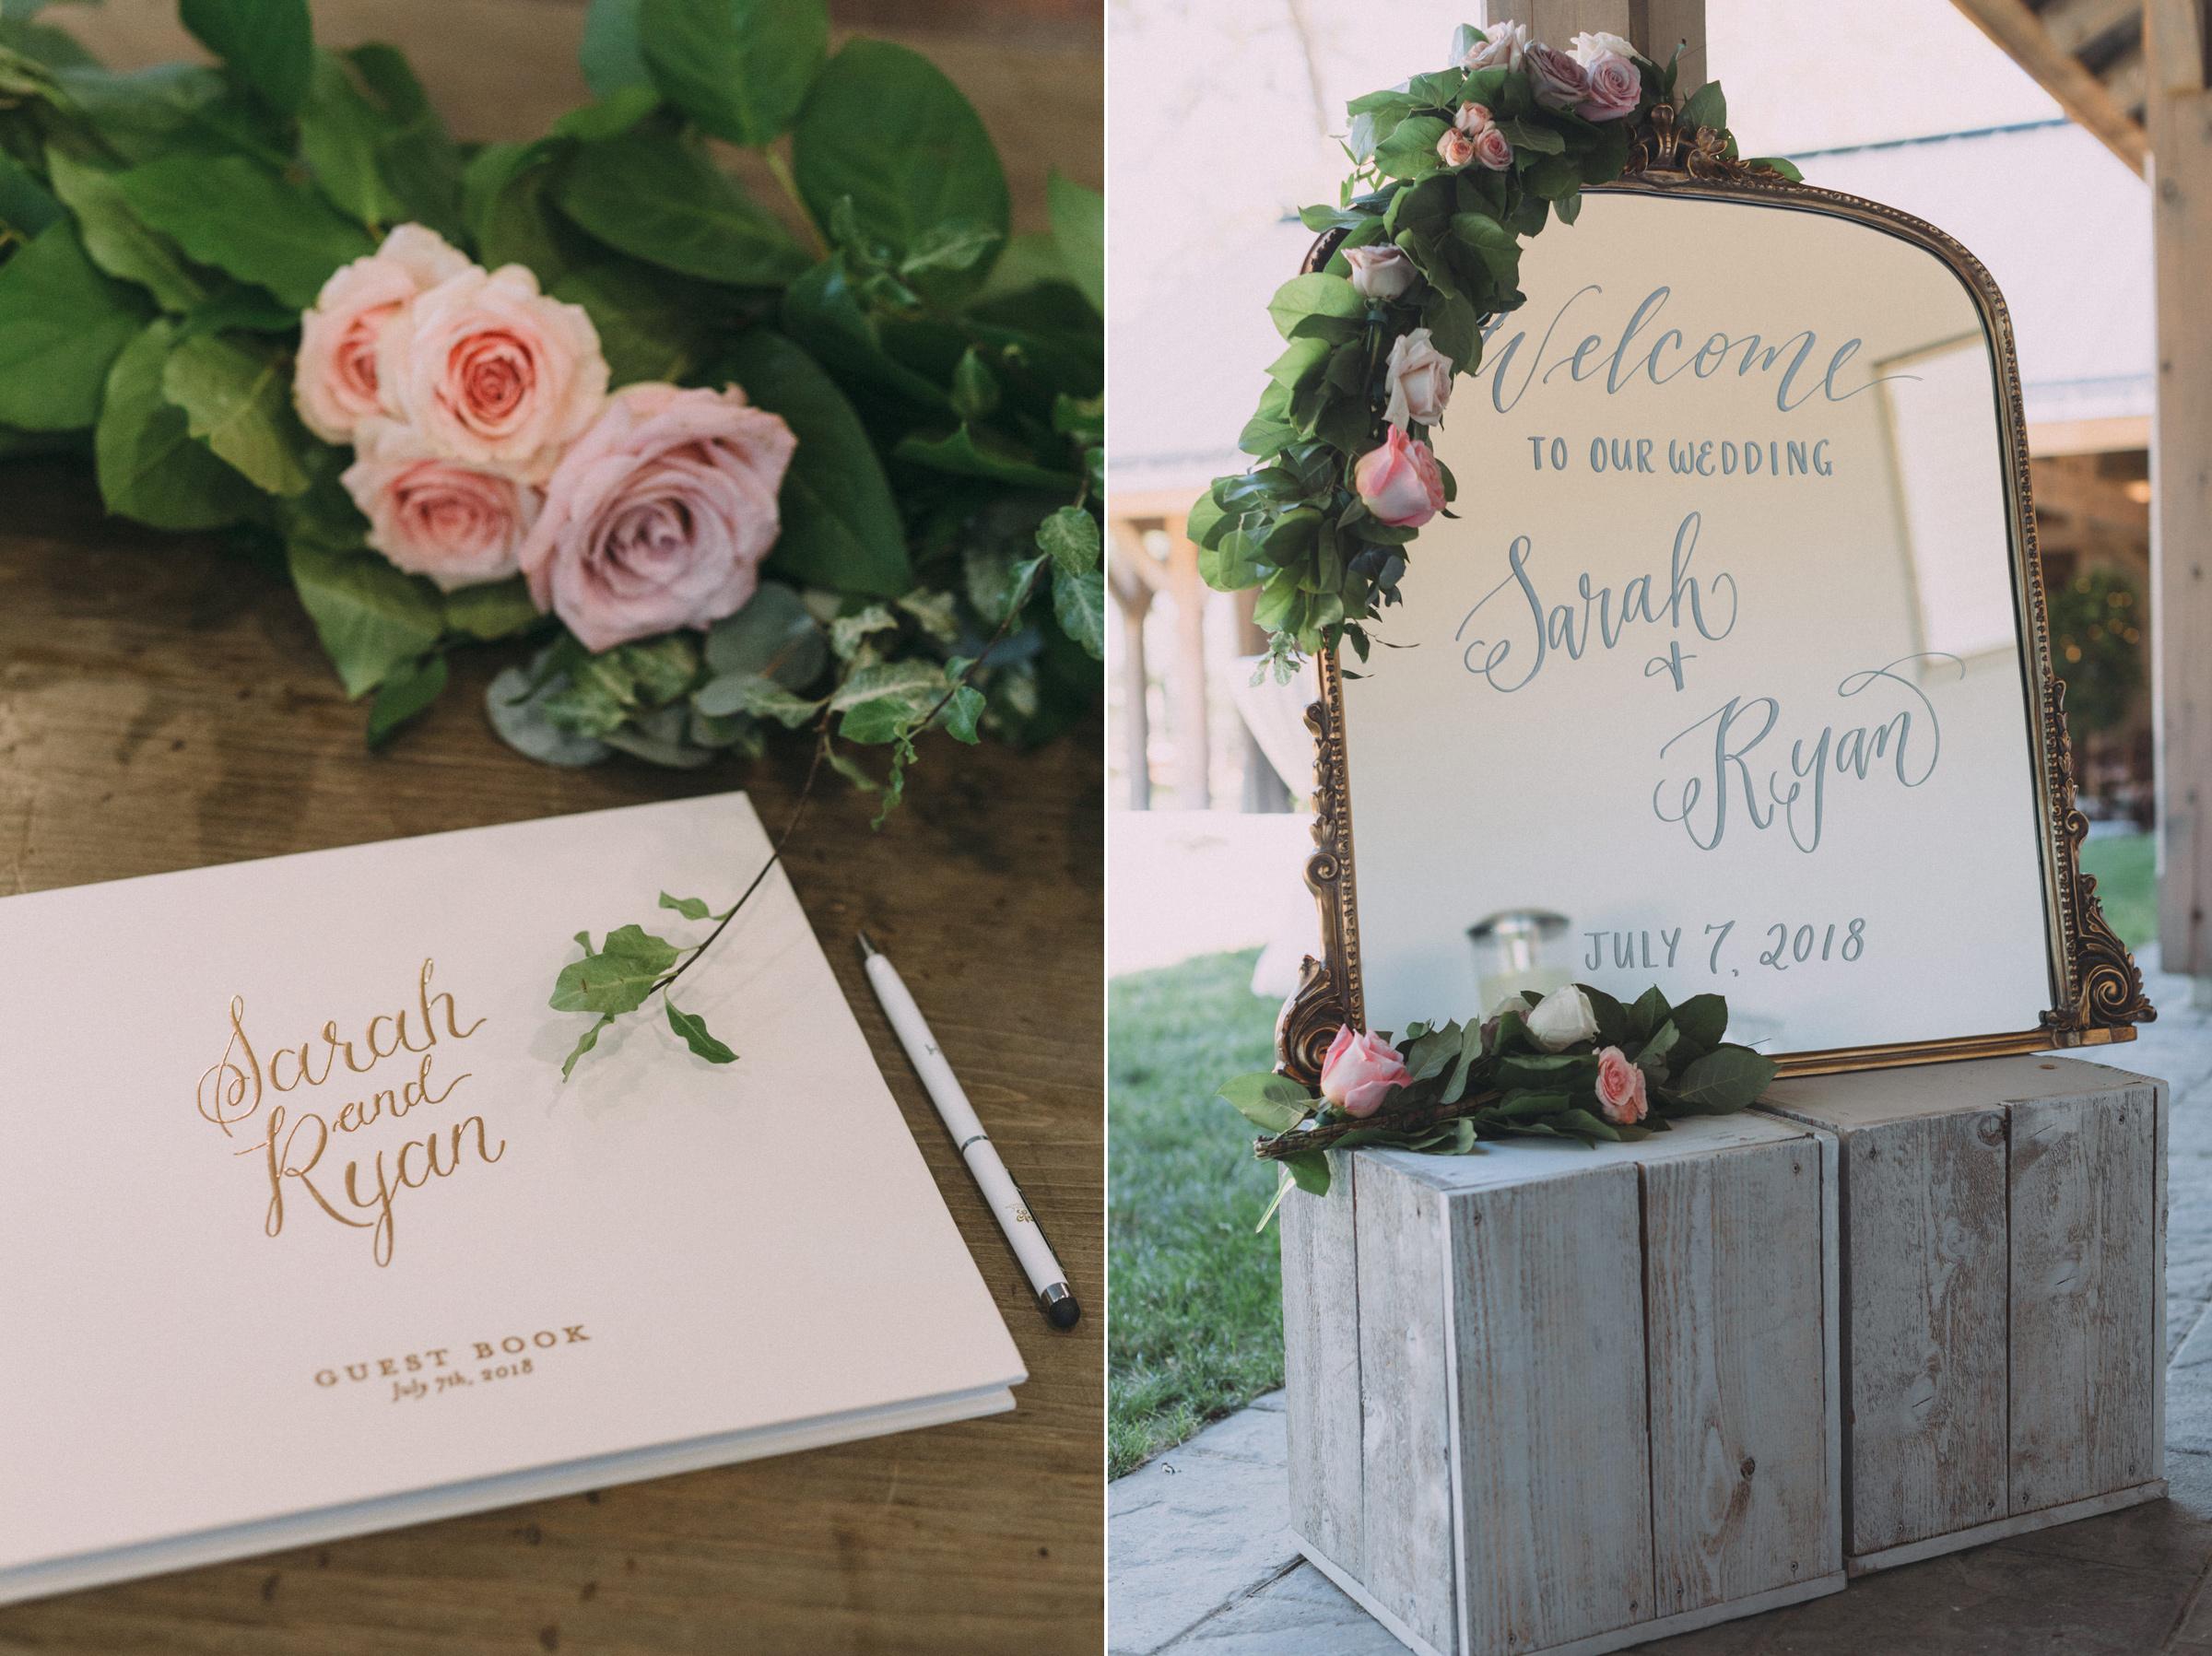 Langdon-Hall-wedding-photography-Cambridge-by-Sam-Wong-of-Visual-Cravings_Sarah-Ryan_26.jpg